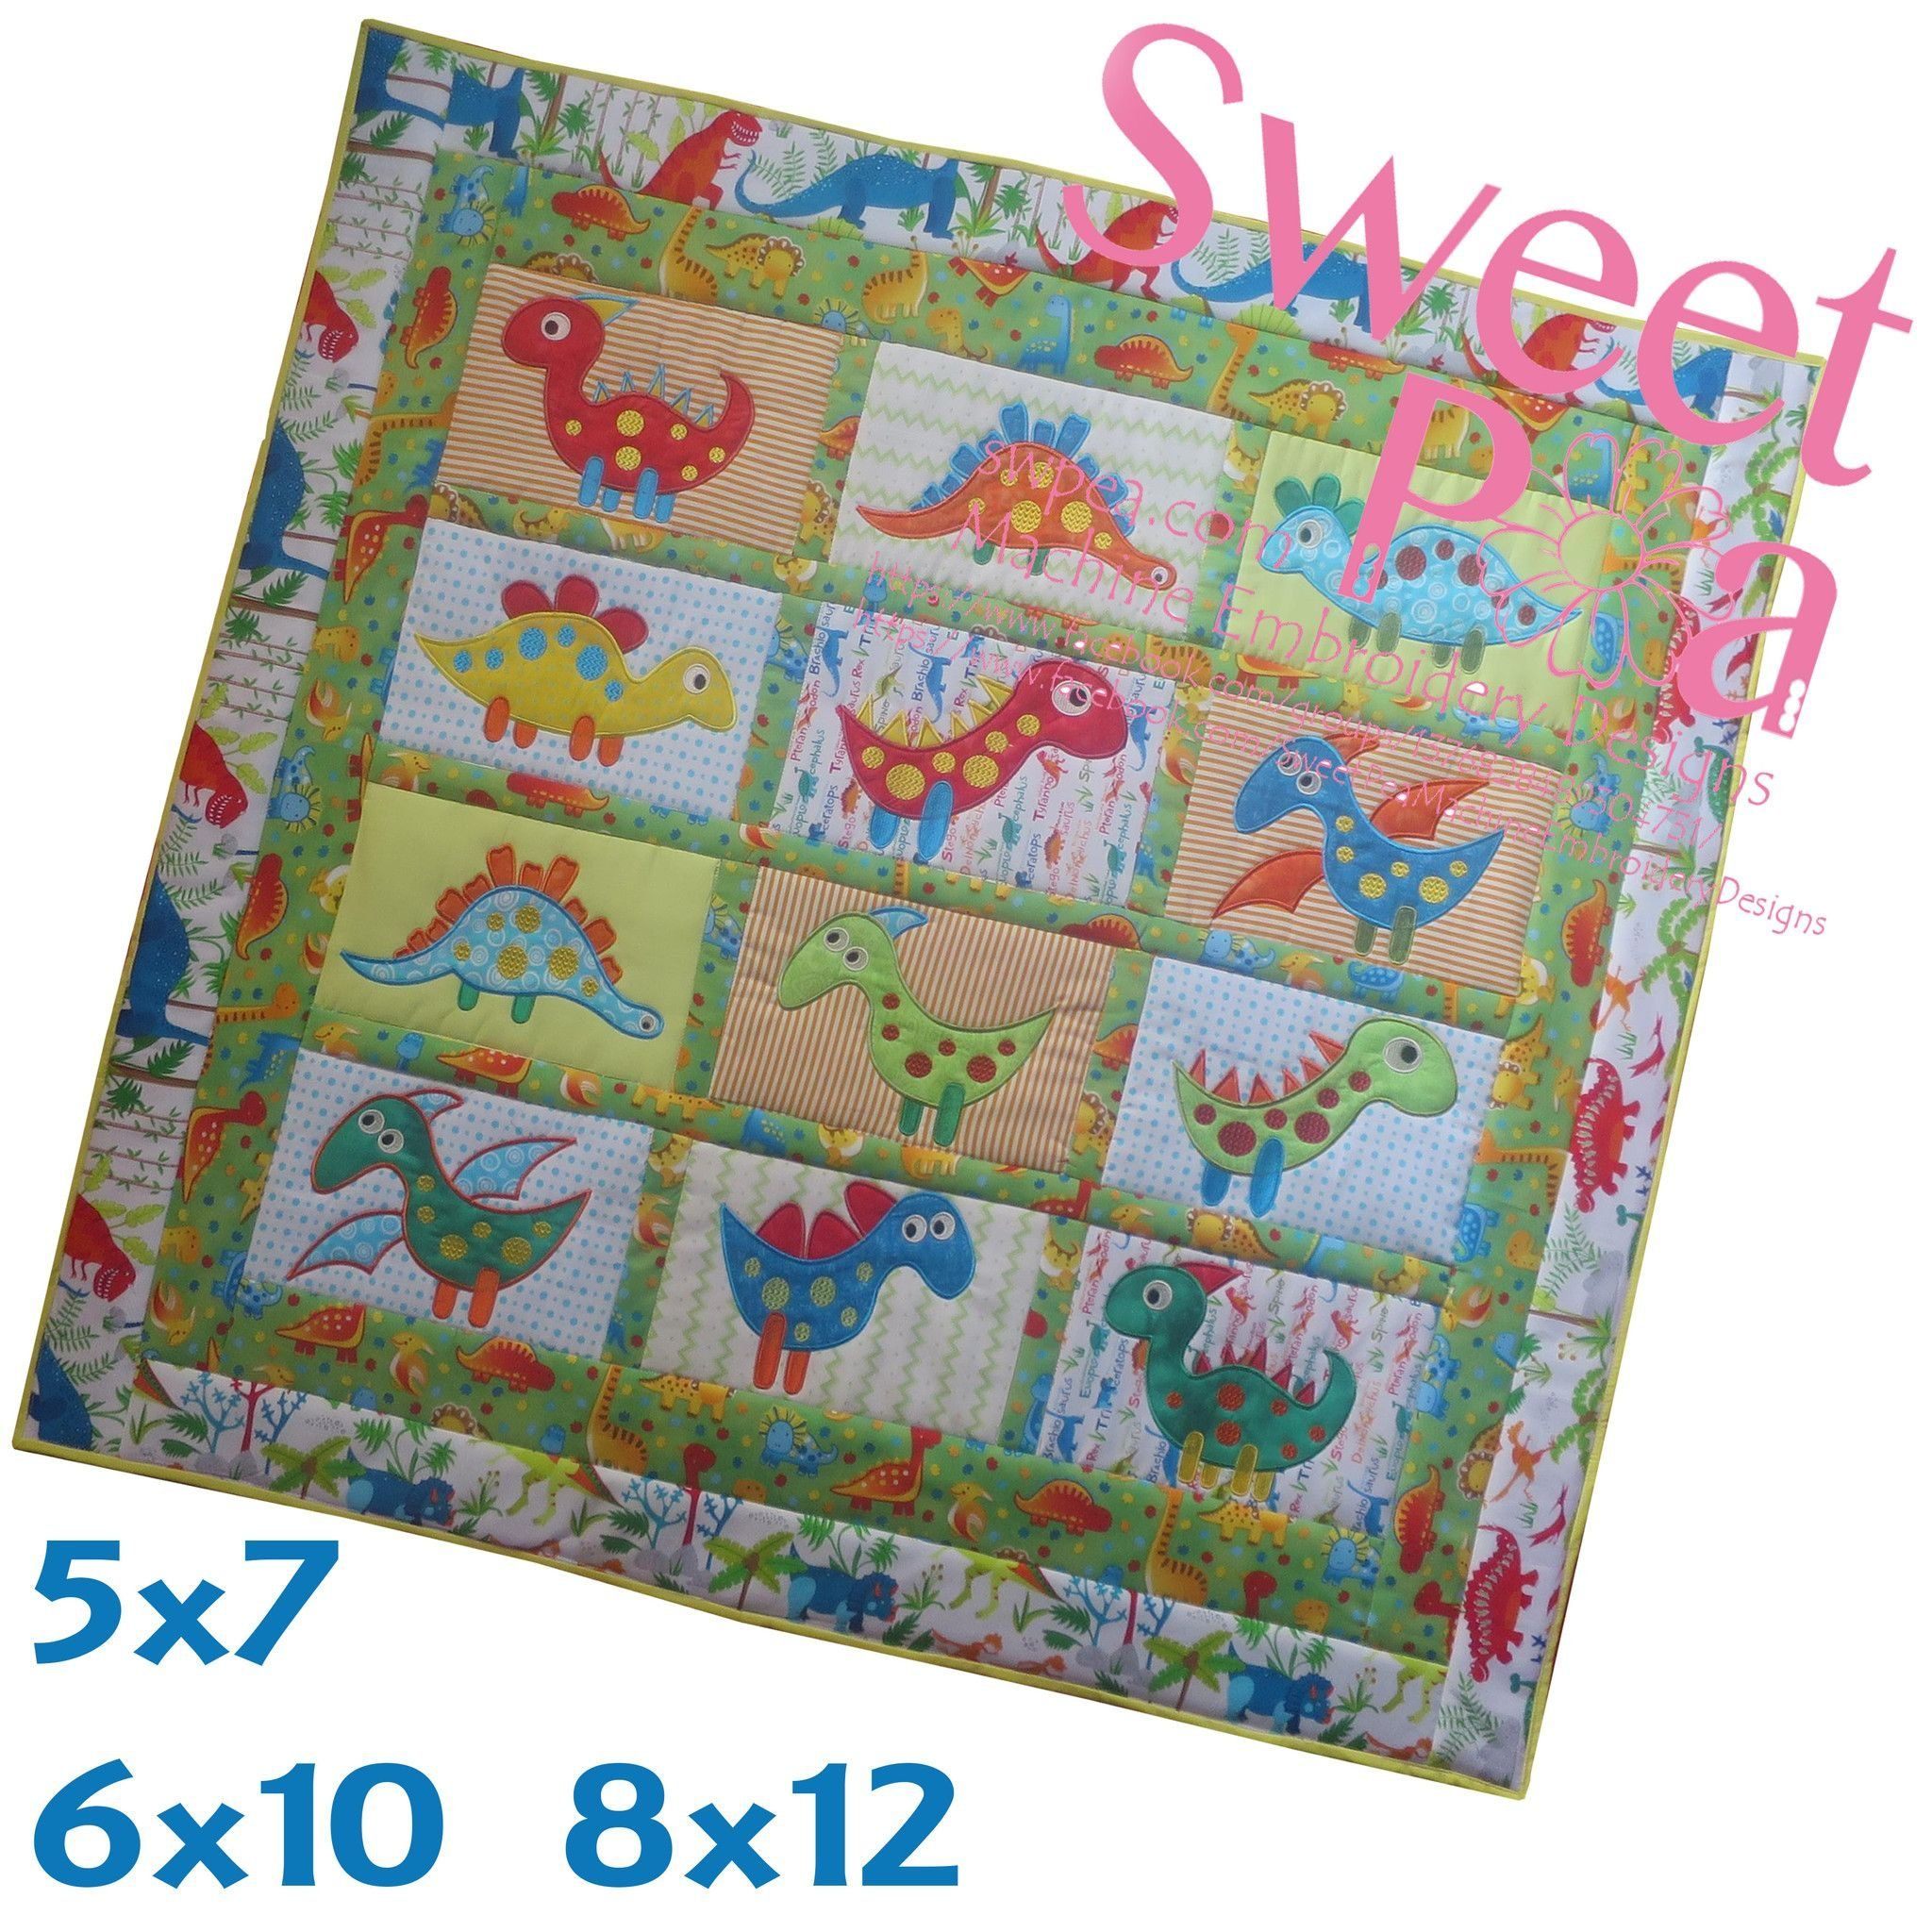 Dinosaur quilt in the hoop 5x7 6x10 8x12 machine embroidery design